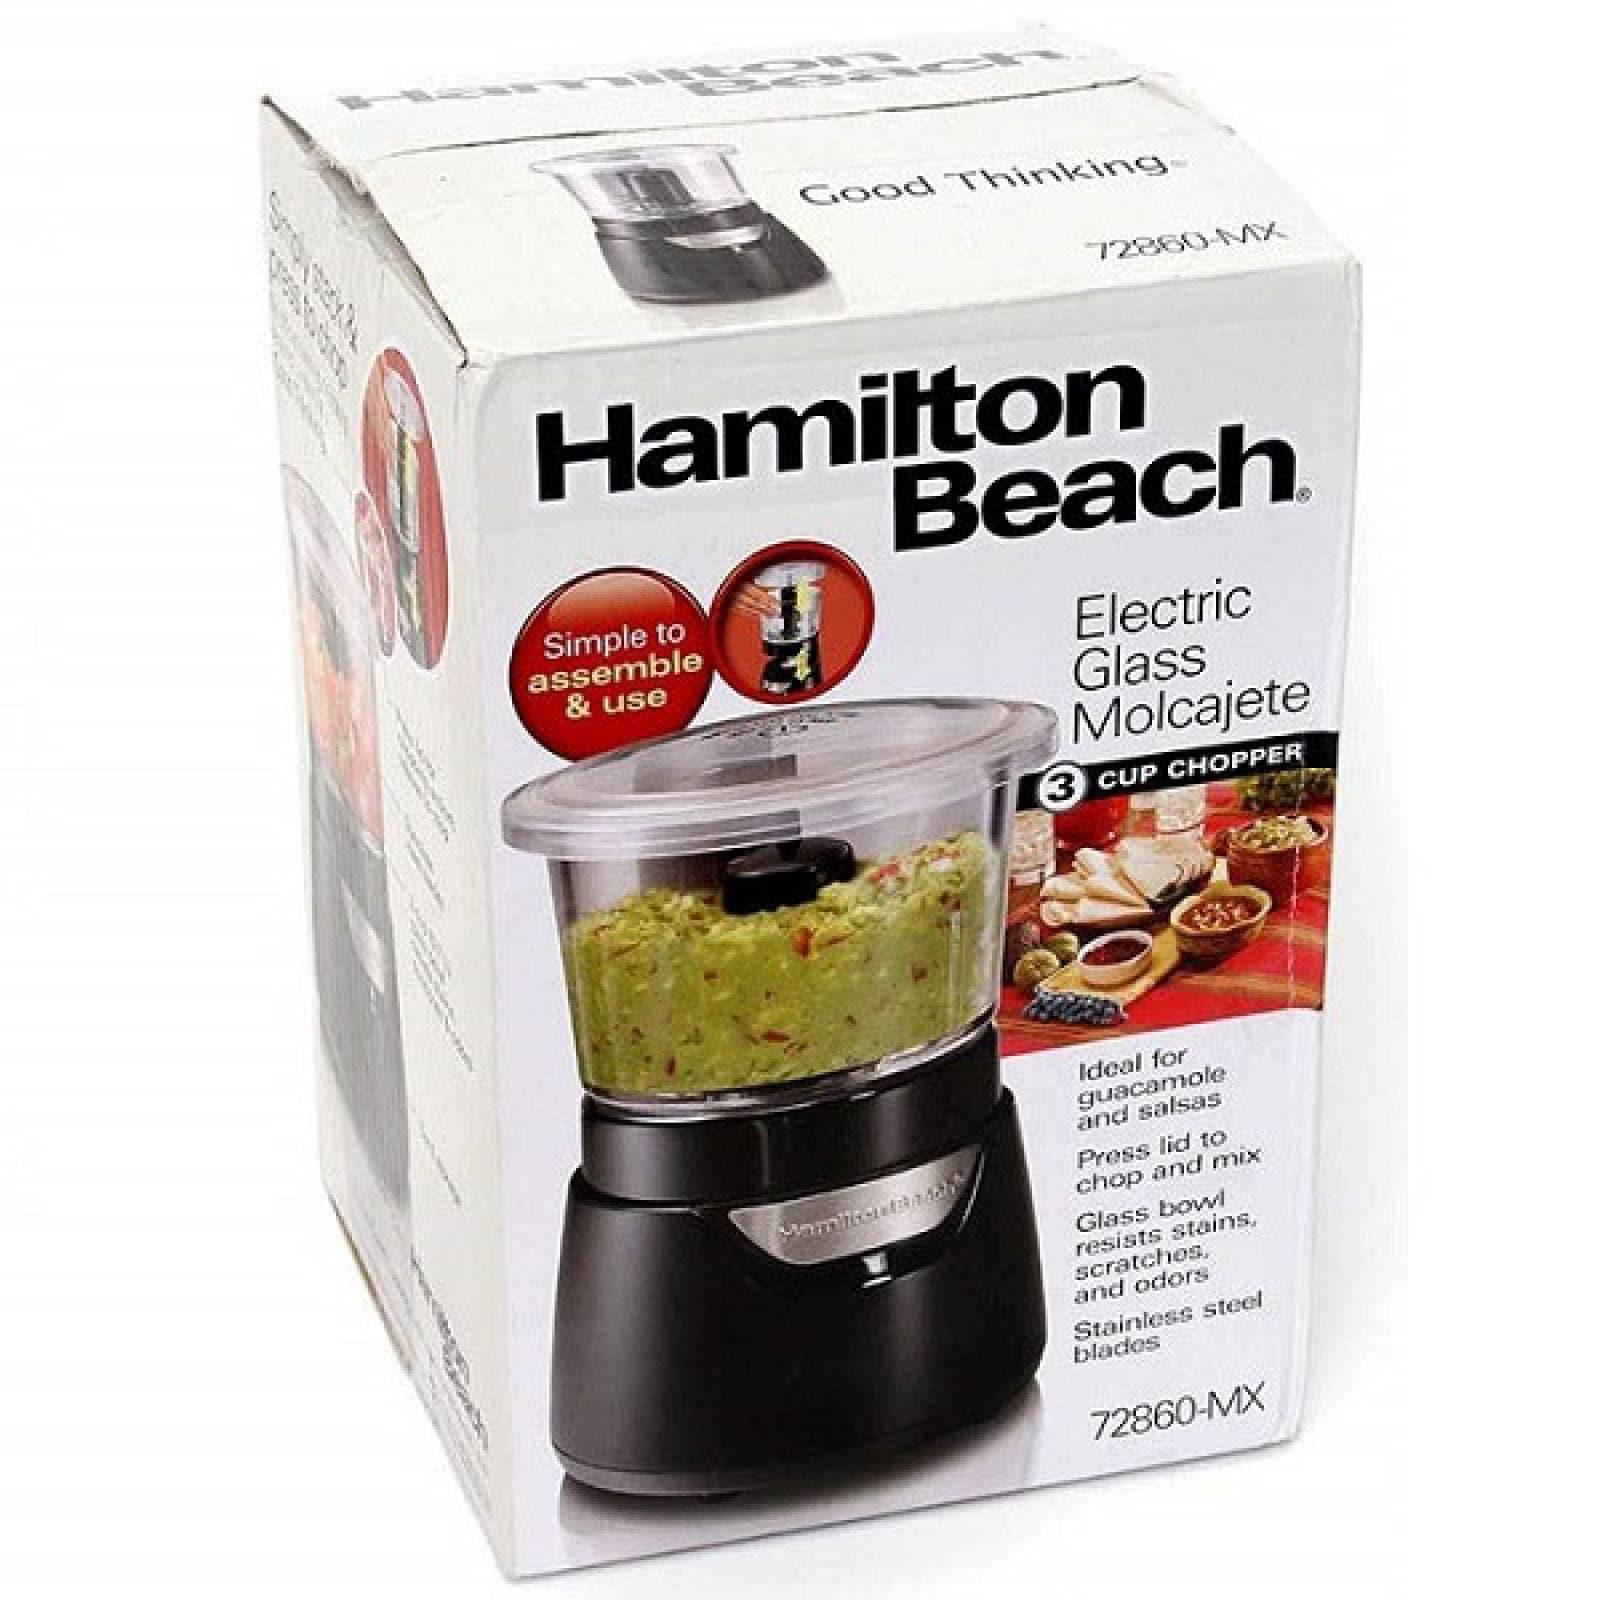 Molcajete electrico Hamilton Beach 3 tazas 72860-MX